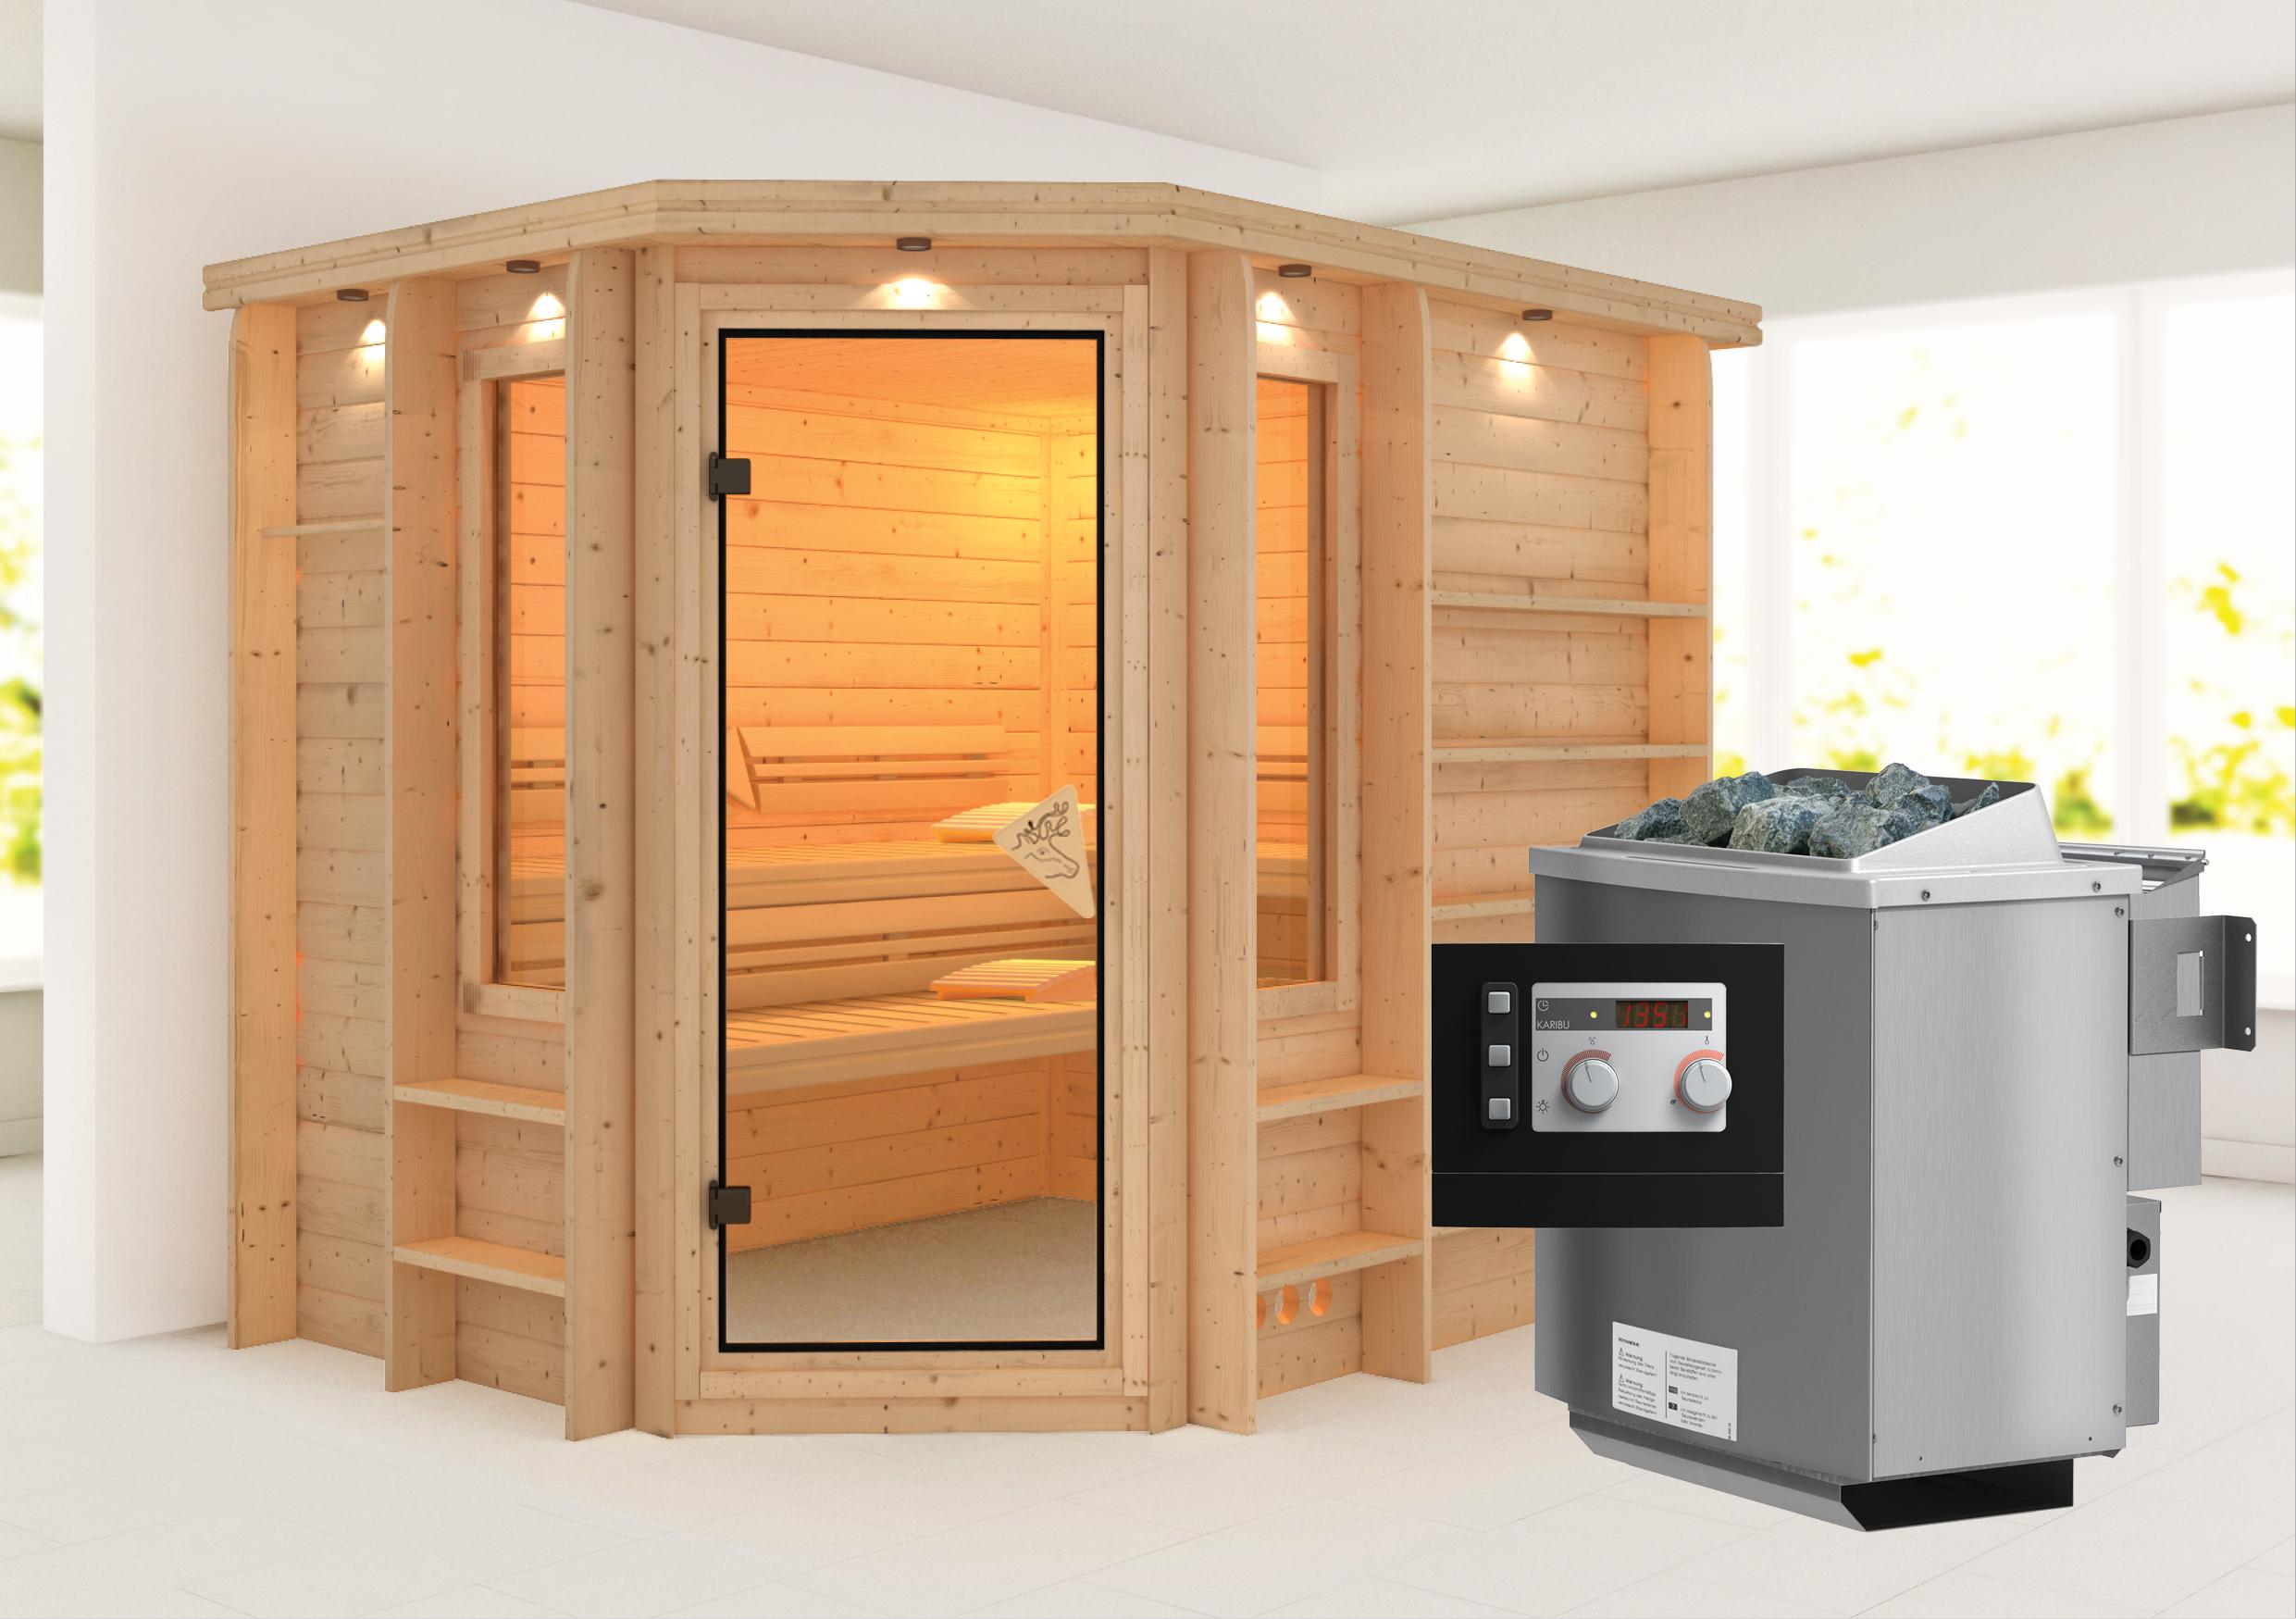 karibu massivholzsauna riona 2 62 x 1 98 m 40 mm mit 9 kw ofen sauna heimsauna ebay. Black Bedroom Furniture Sets. Home Design Ideas